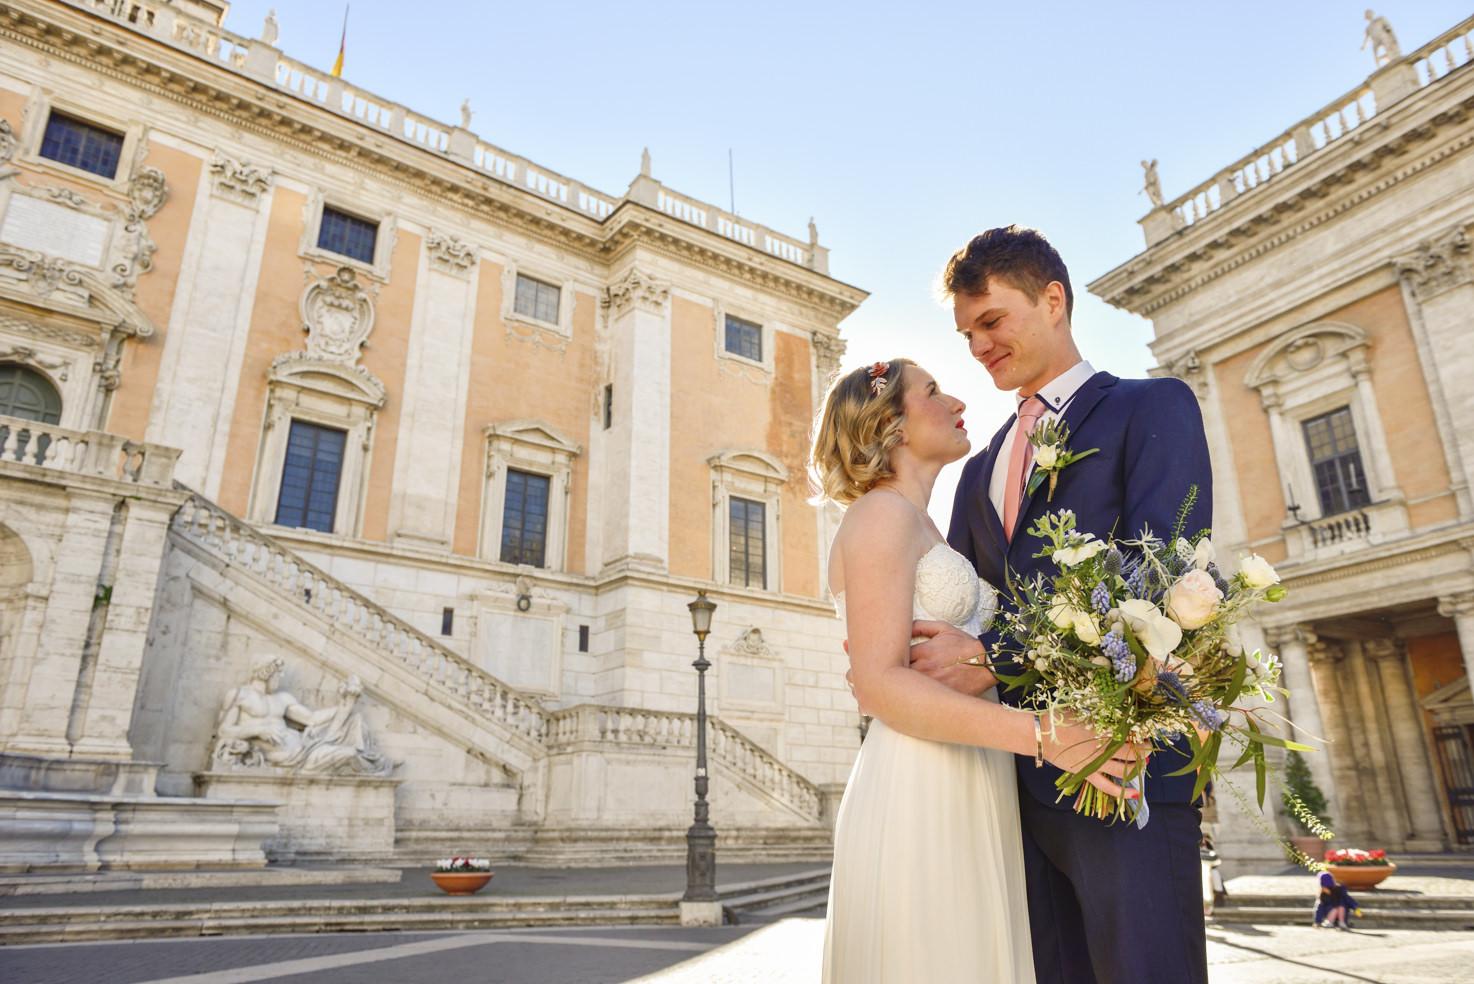 Bride and groom at Campidoglio Square